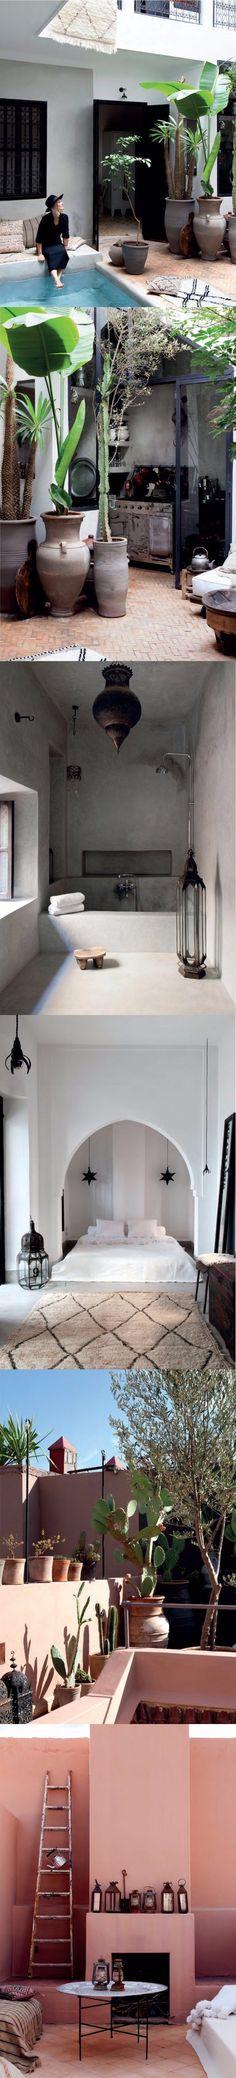 massive struktur ideen terrassen berdachung holz spanischer stil pinterest. Black Bedroom Furniture Sets. Home Design Ideas